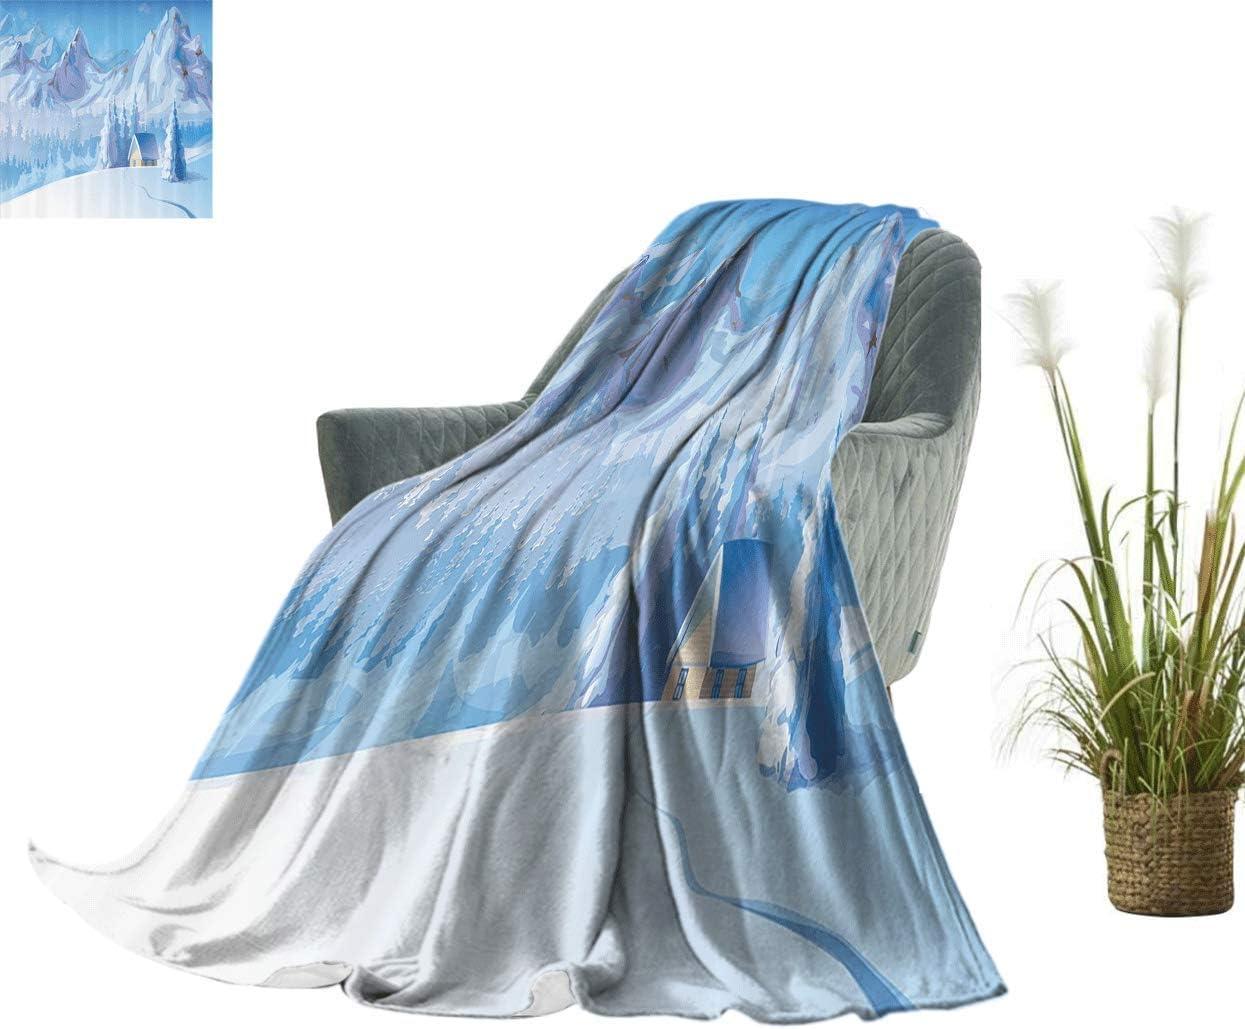 Coloufules Winter Decor Light Blanket Max 62% OFF Brand new Below House Majesti Little